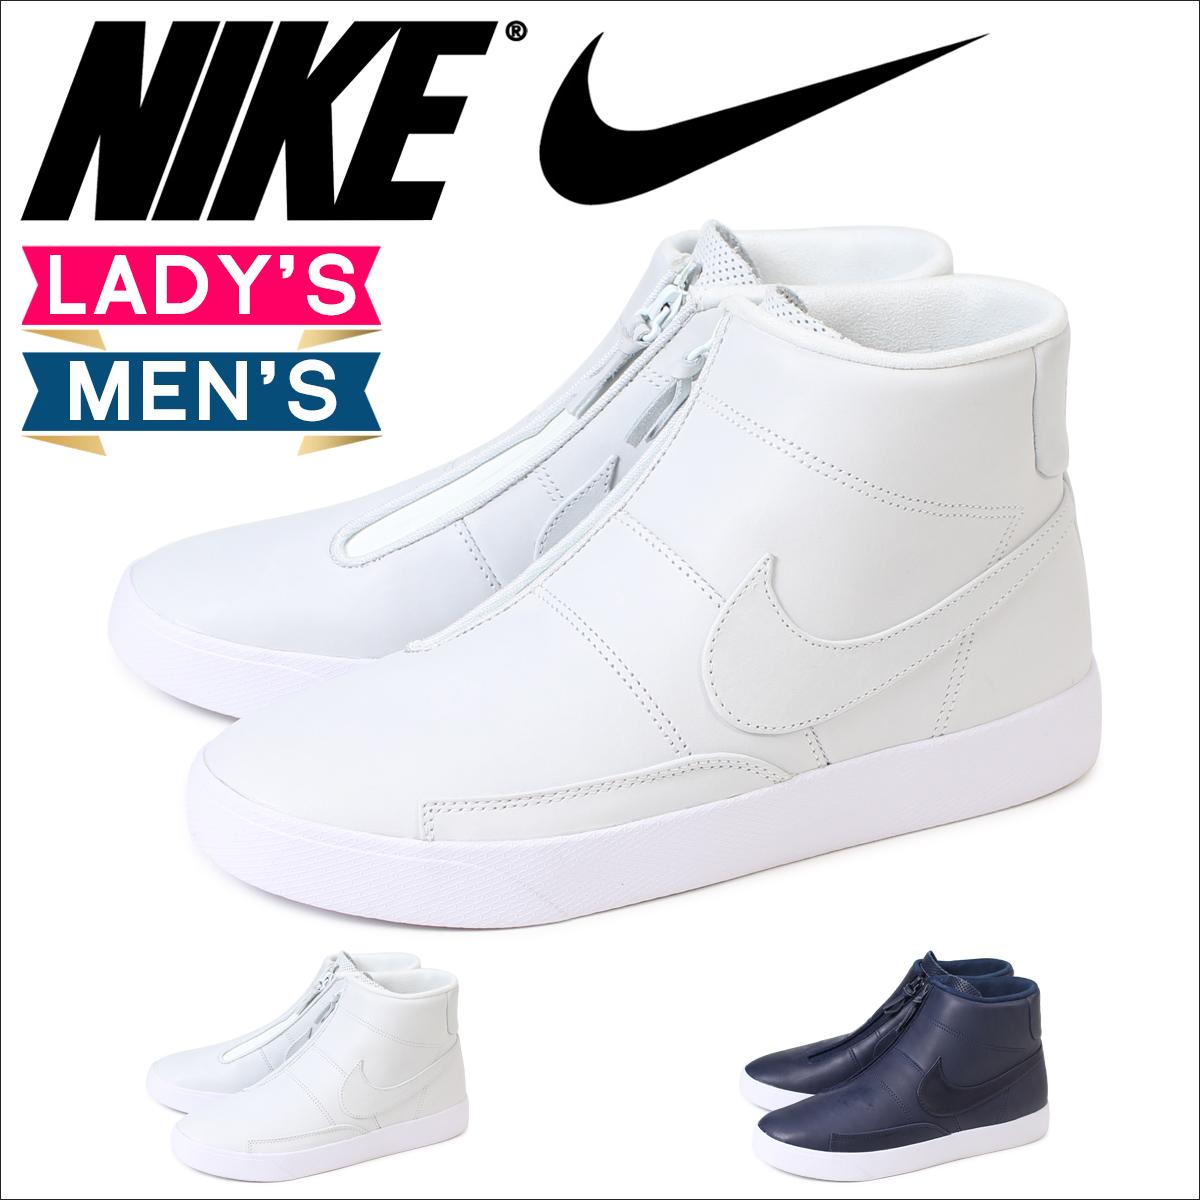 Nike Blazer Bas Wagon Cru Rouge